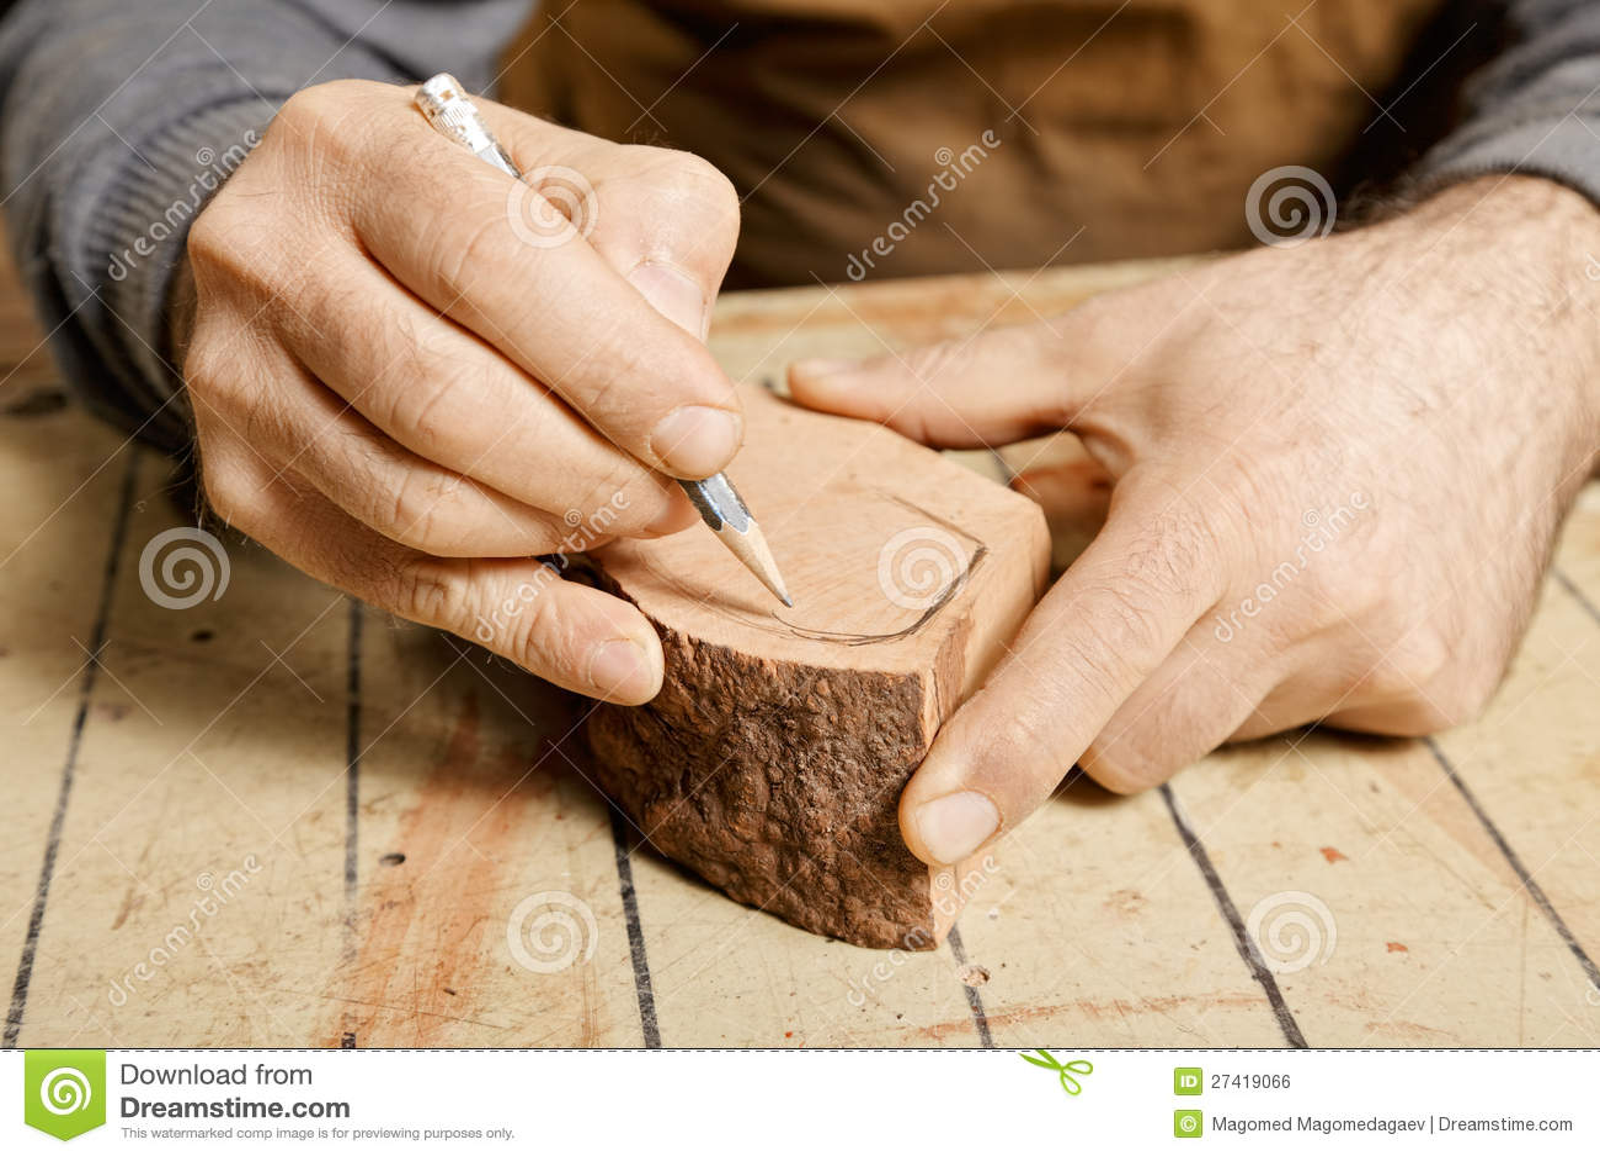 Woodworker Hands Sketching On Wood Billet Royalty Free